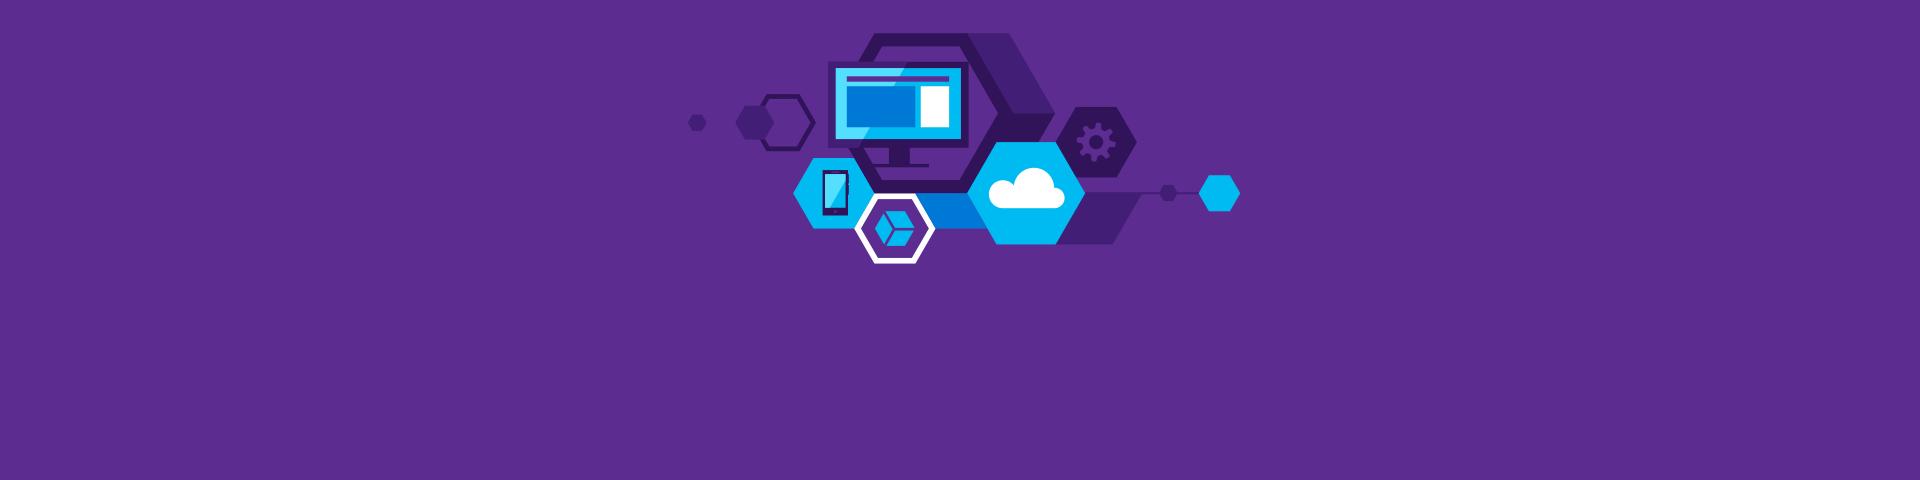 Komputer, smartfon, chmura i inne ikony programów